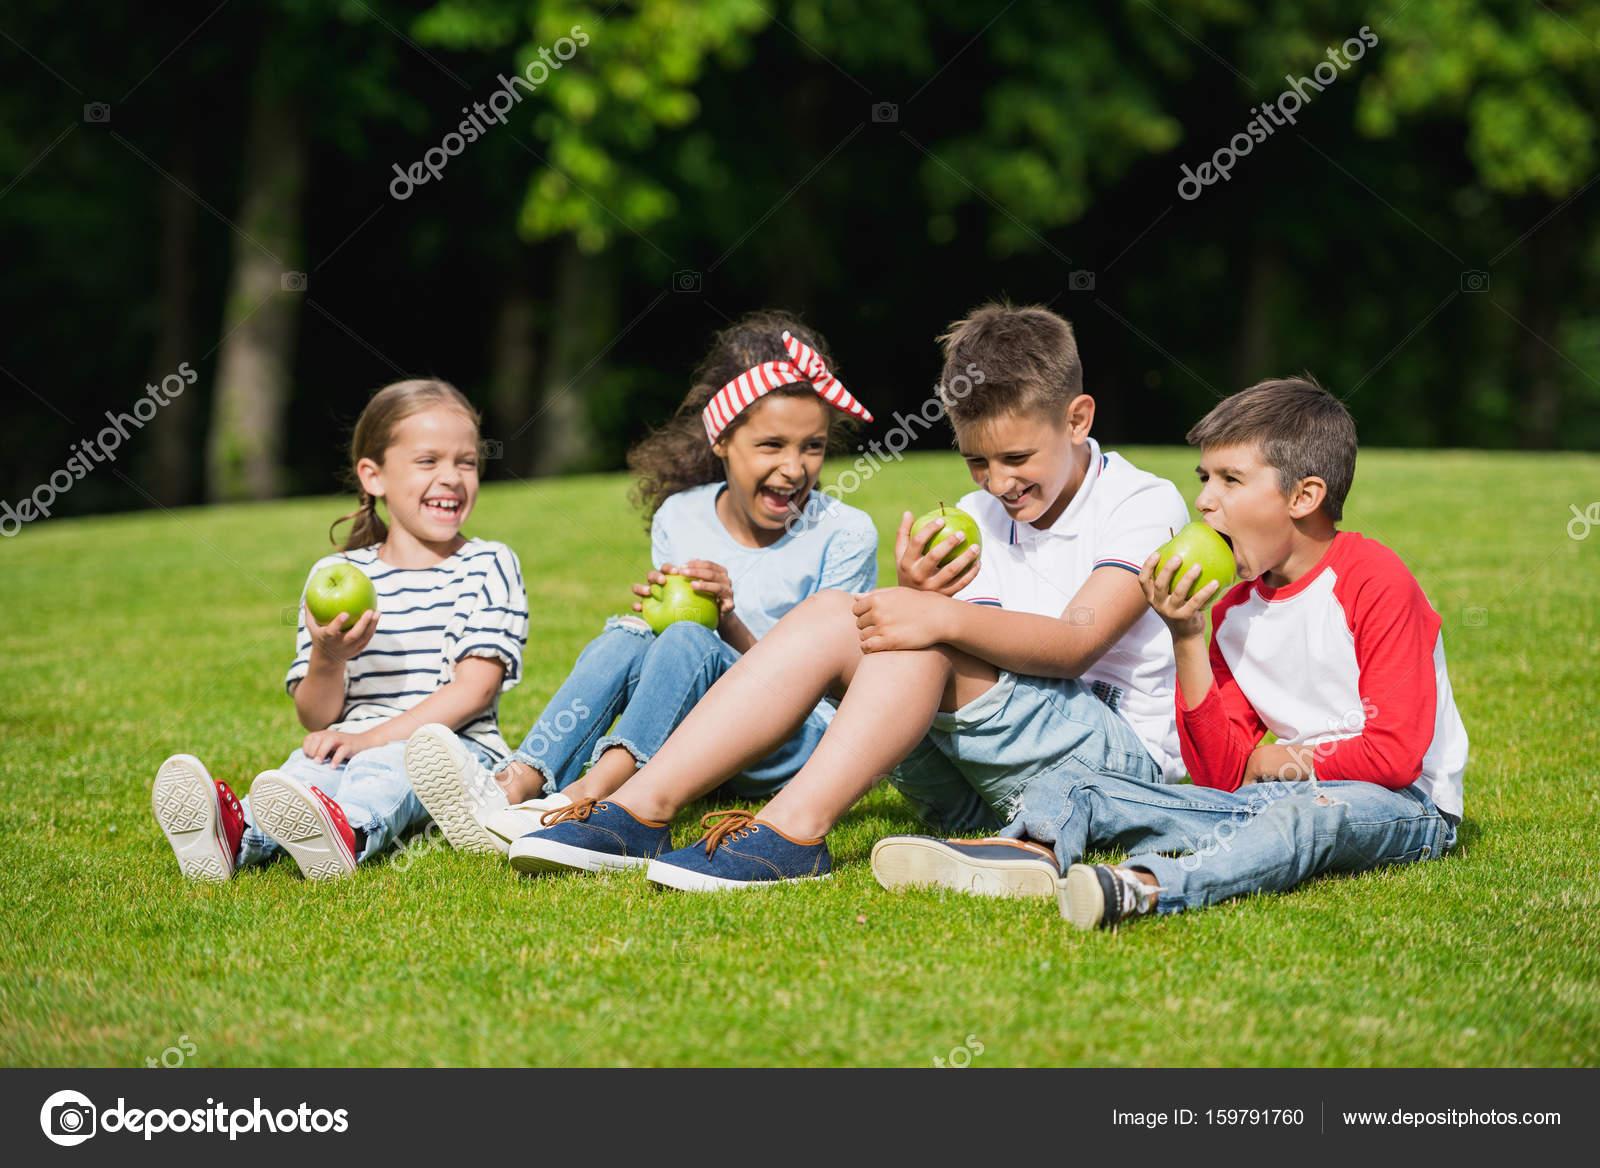 enfants manger des pommes dans le parc photographie alebloshka 159791760. Black Bedroom Furniture Sets. Home Design Ideas